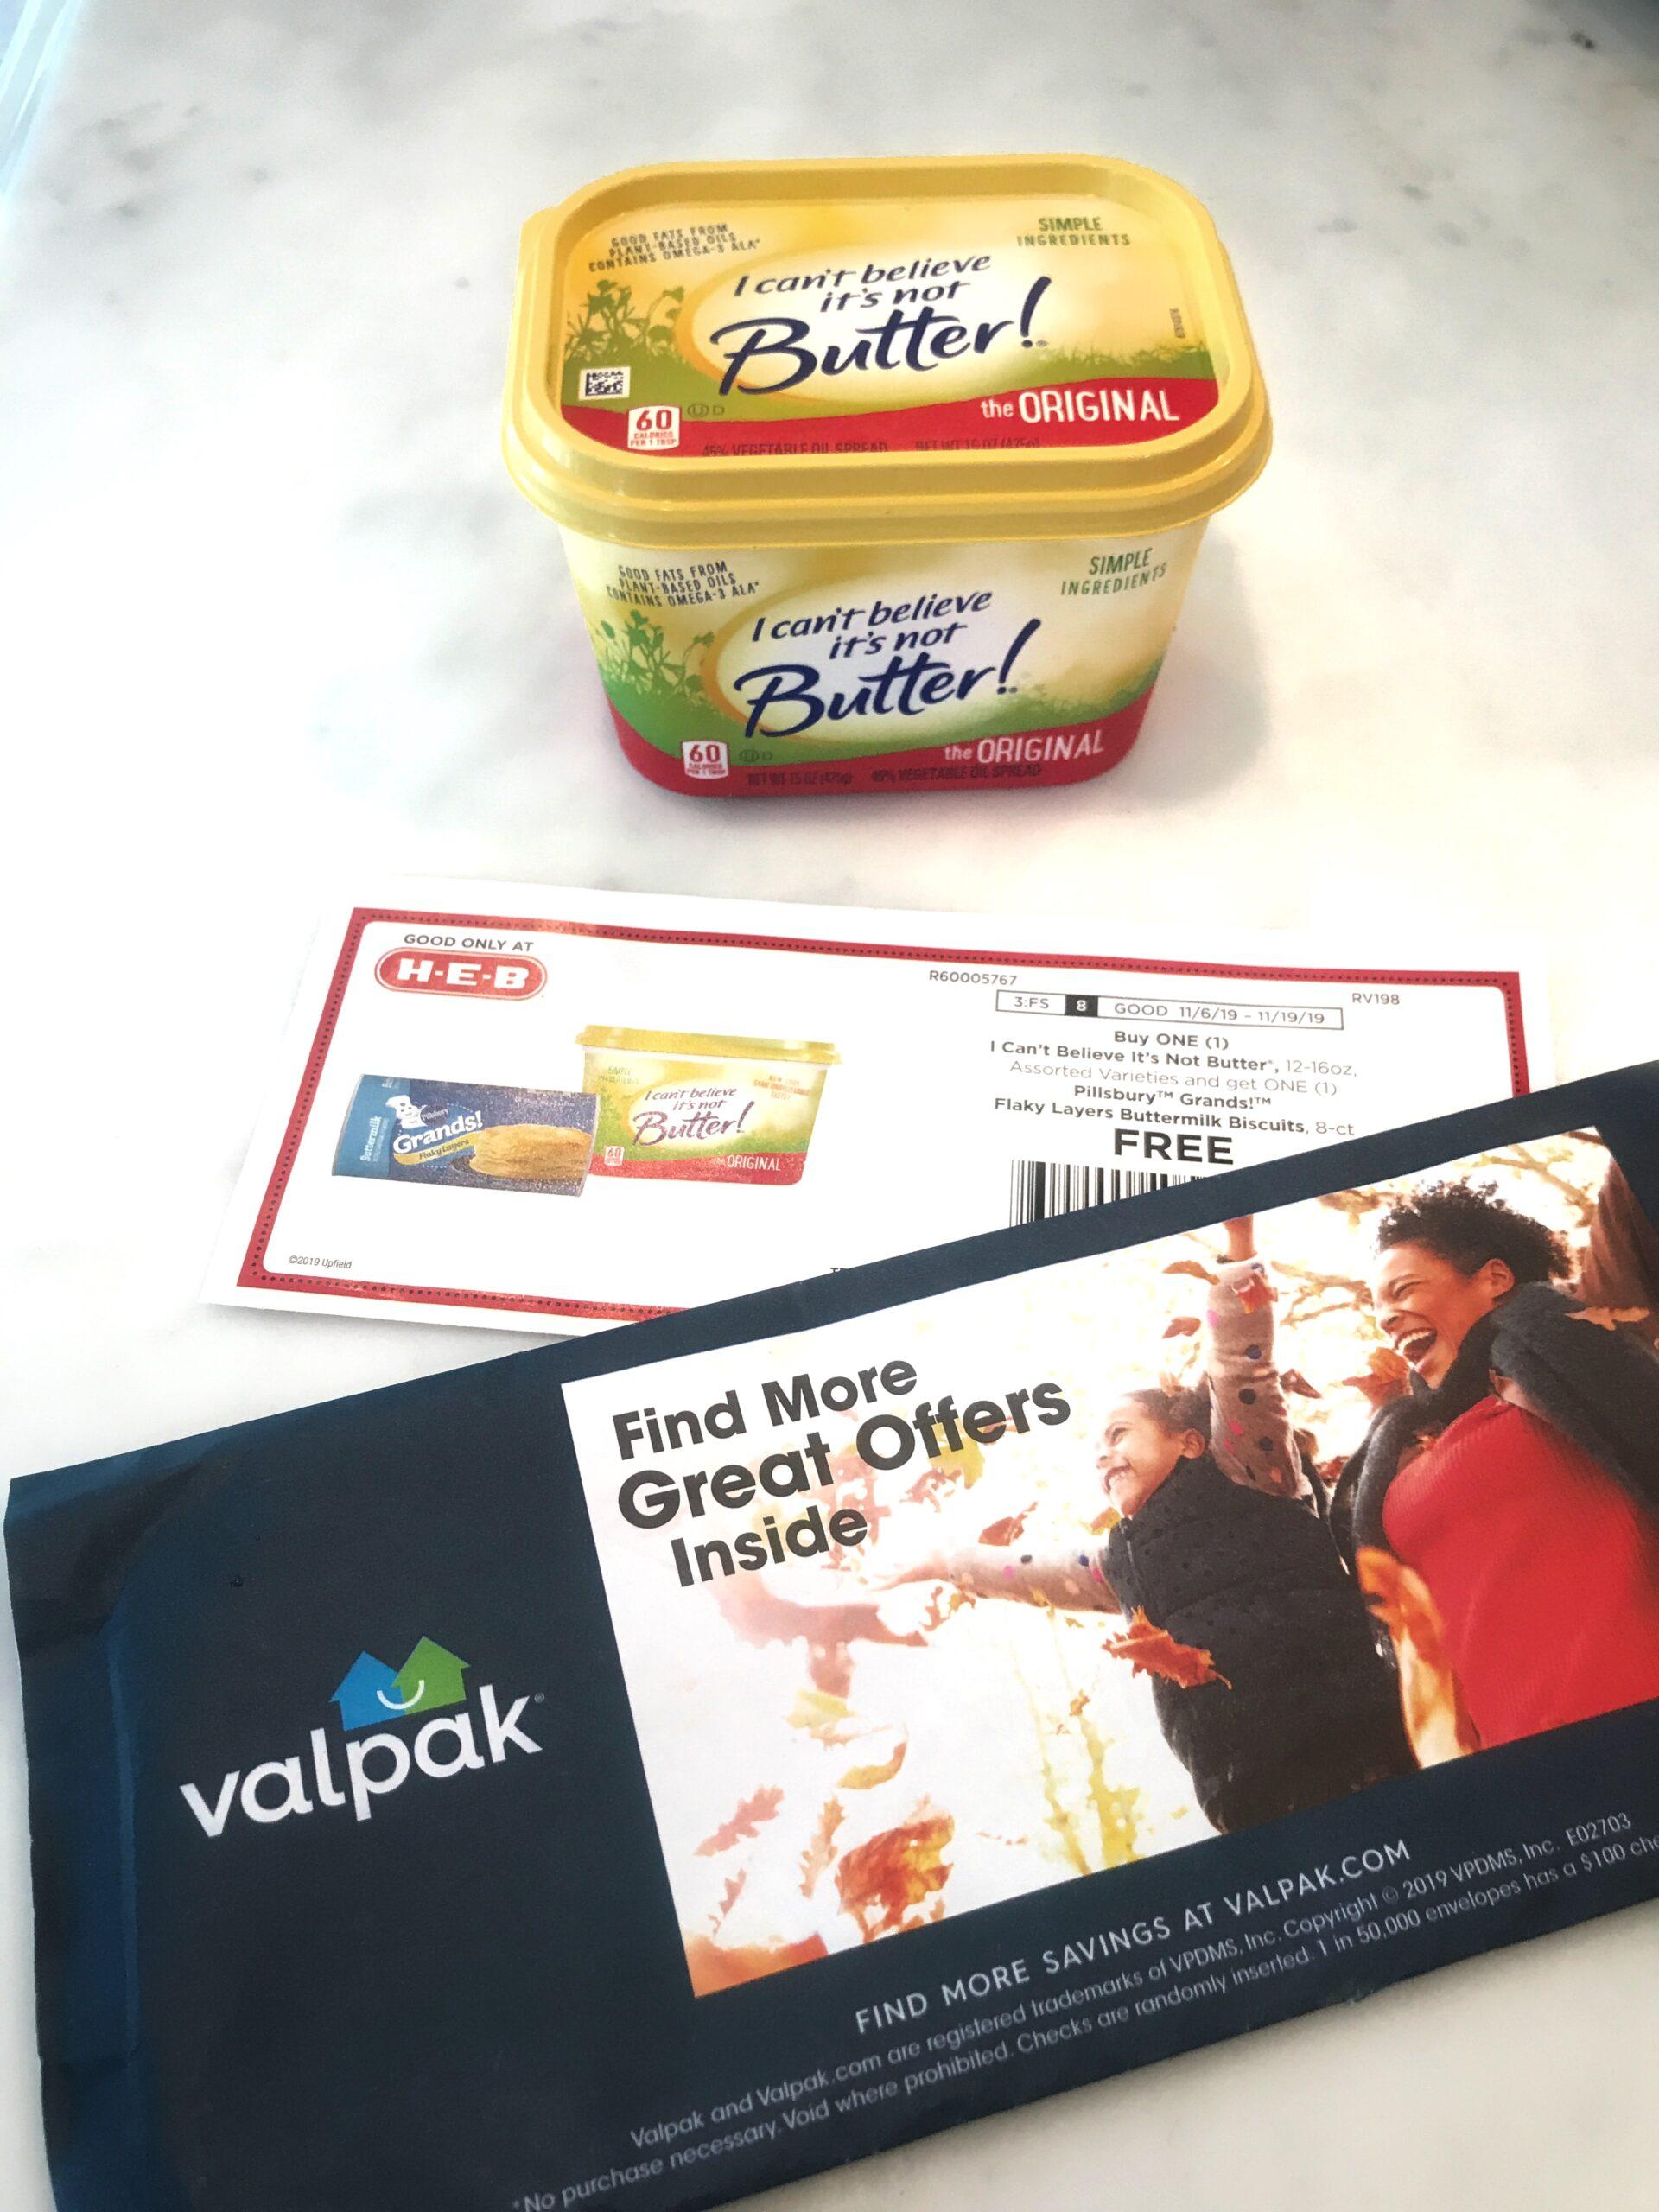 Buy I Can't Believe It's Not Butter, get Pillsbury Grands free